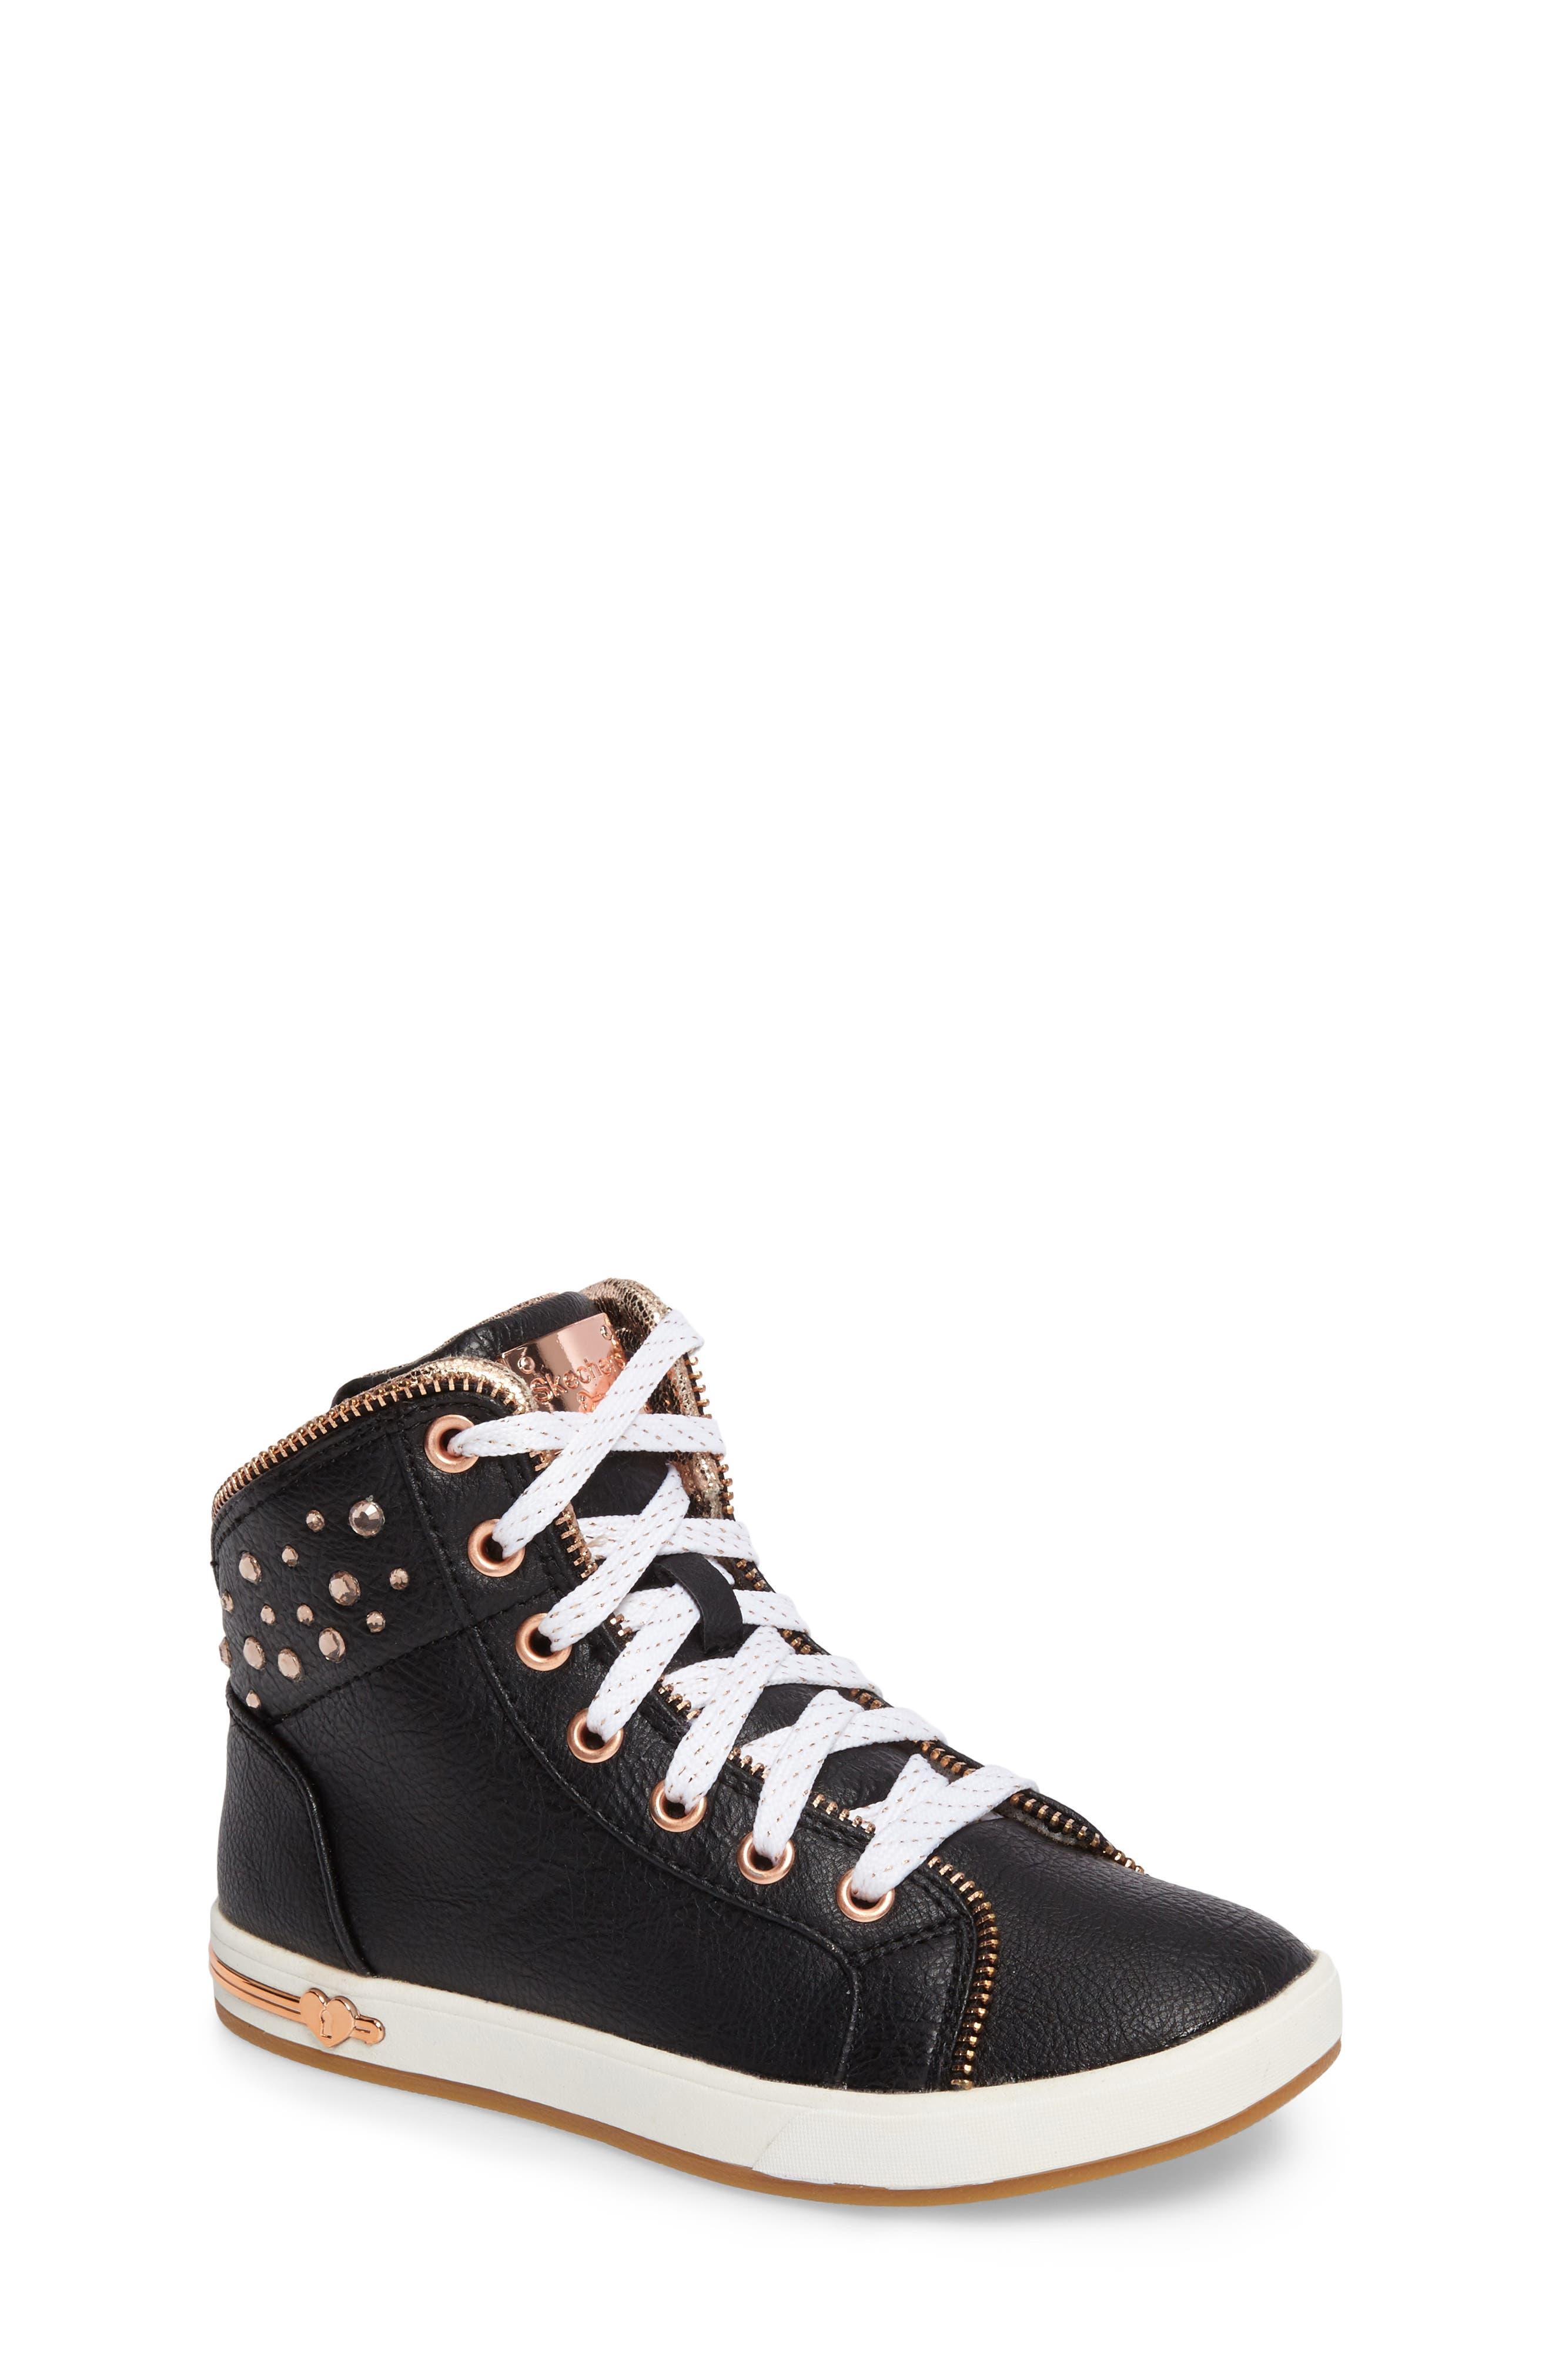 Shoutouts Embellished High Top Sneaker,                             Main thumbnail 1, color,                             Black/ Rose Gold